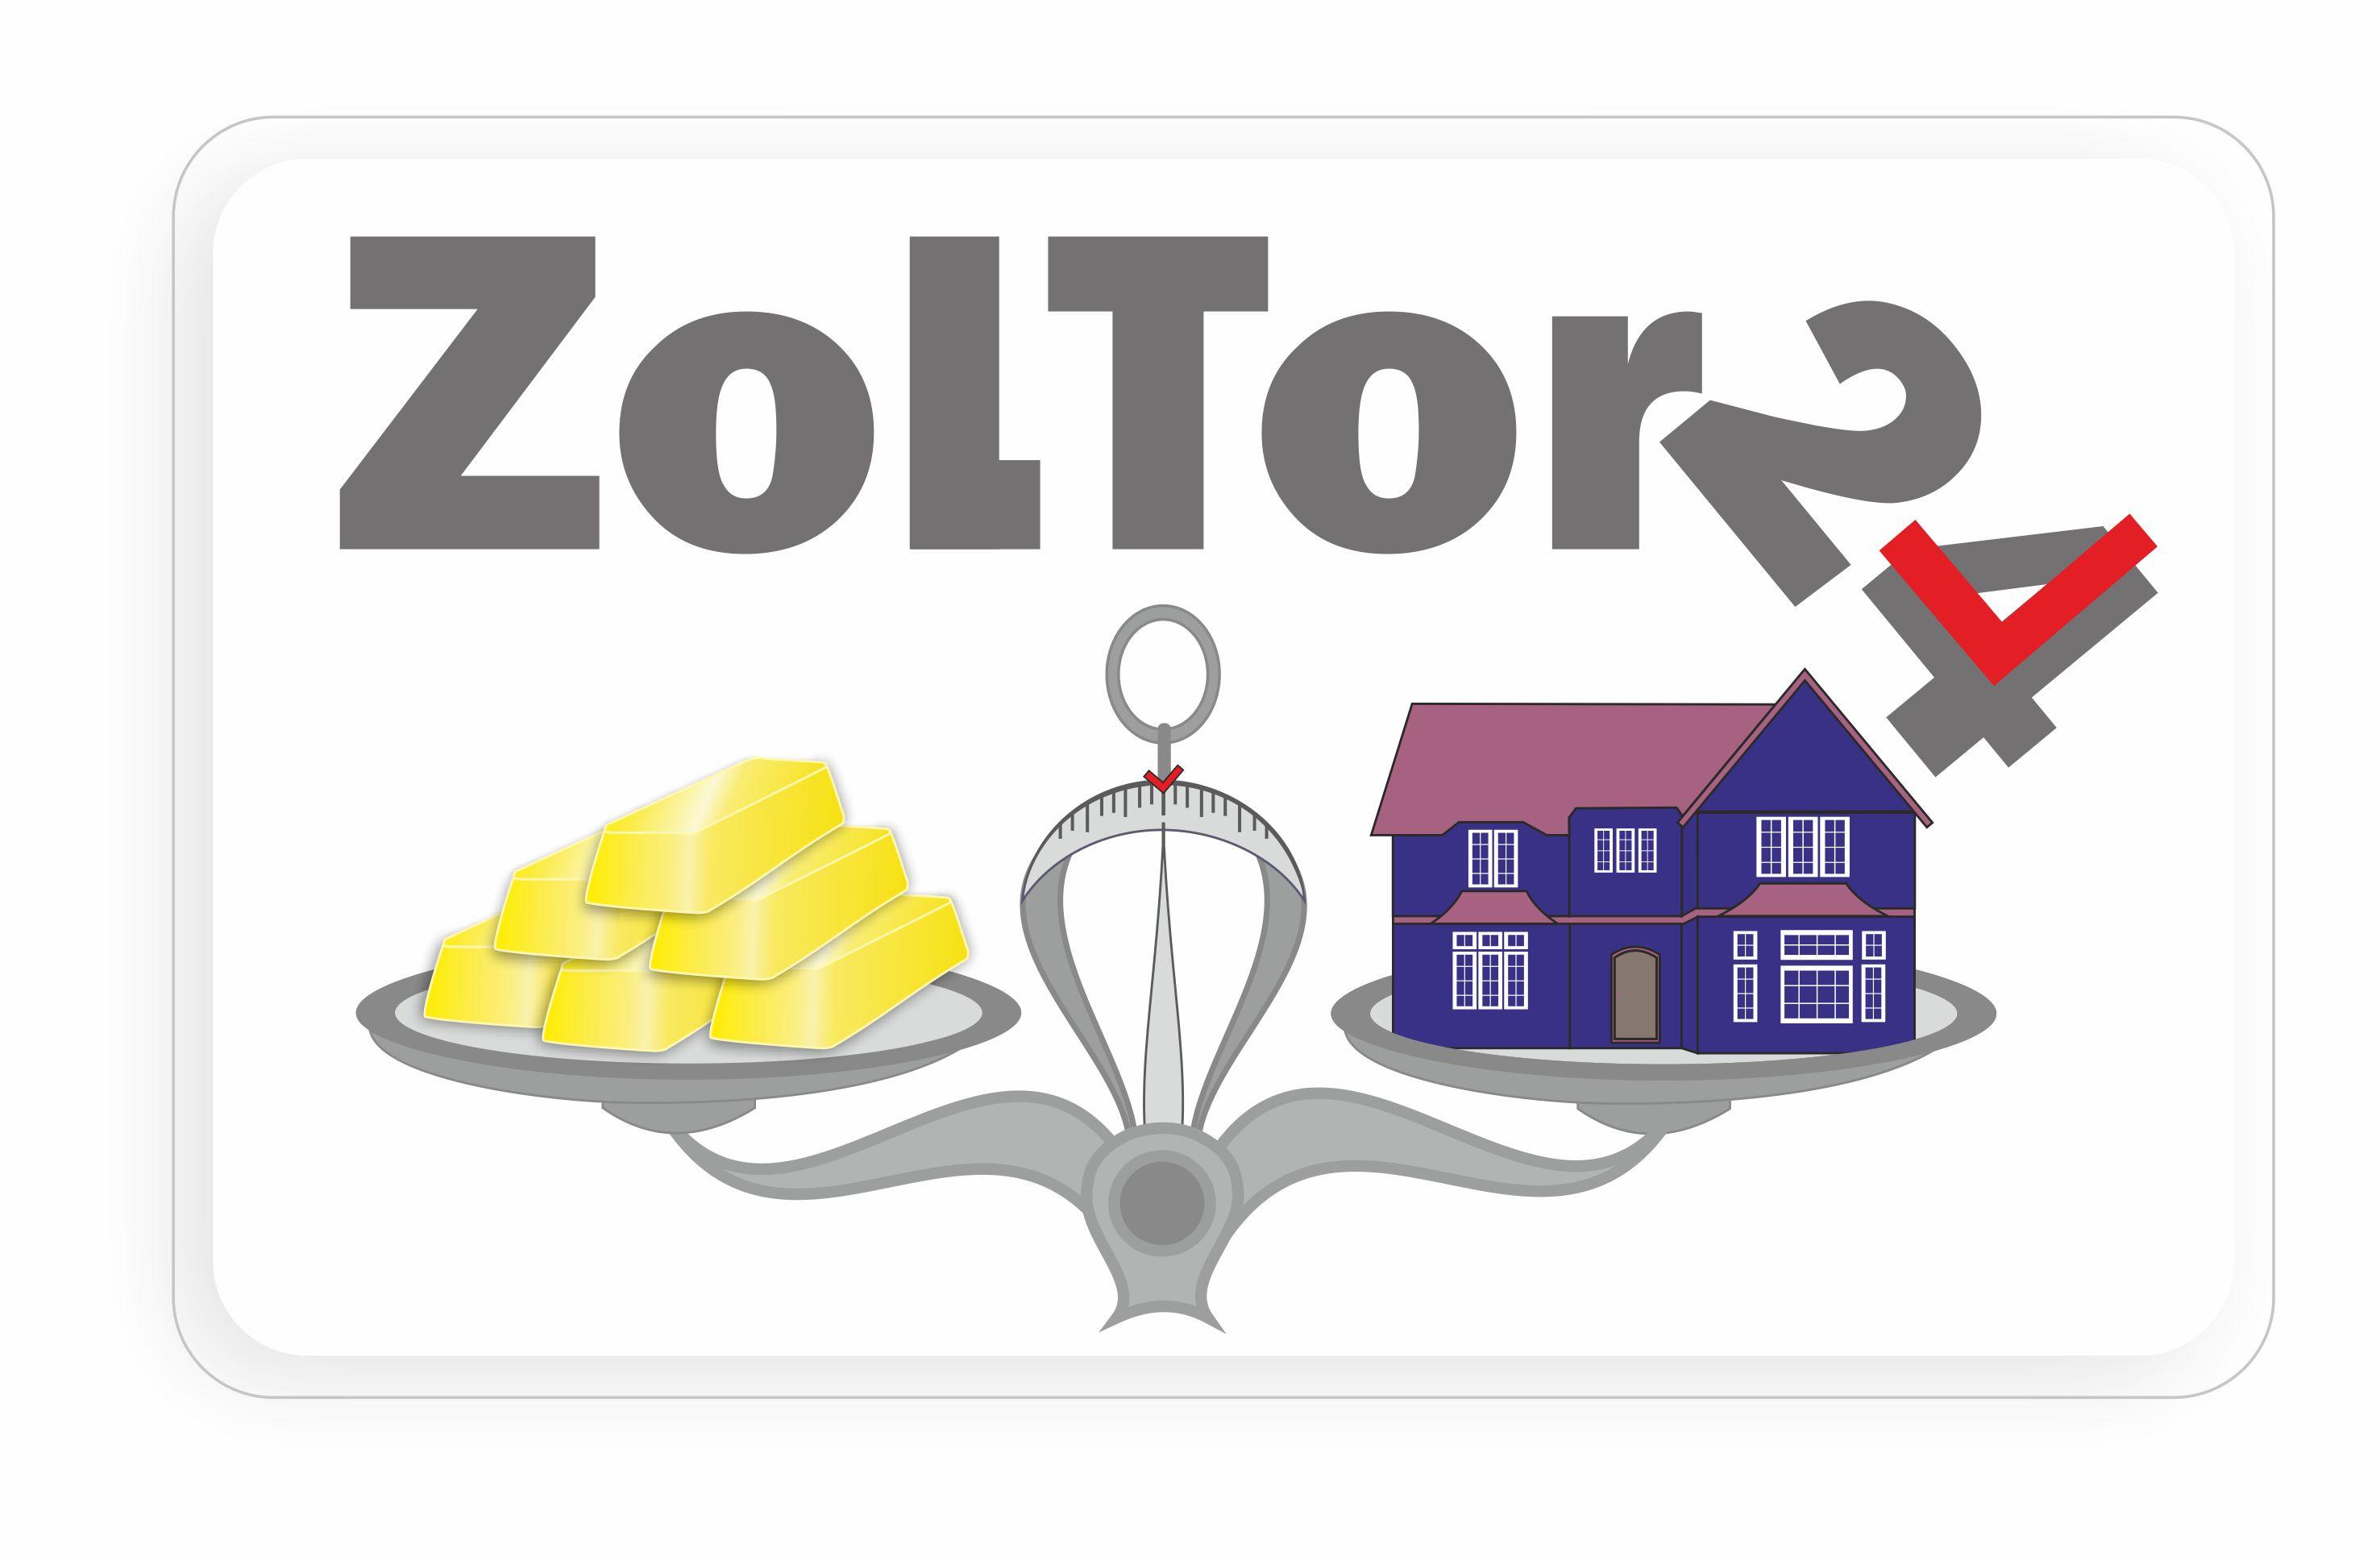 Логотип и фирменный стиль ZolTor24 фото f_4415c969c82b802b.jpg